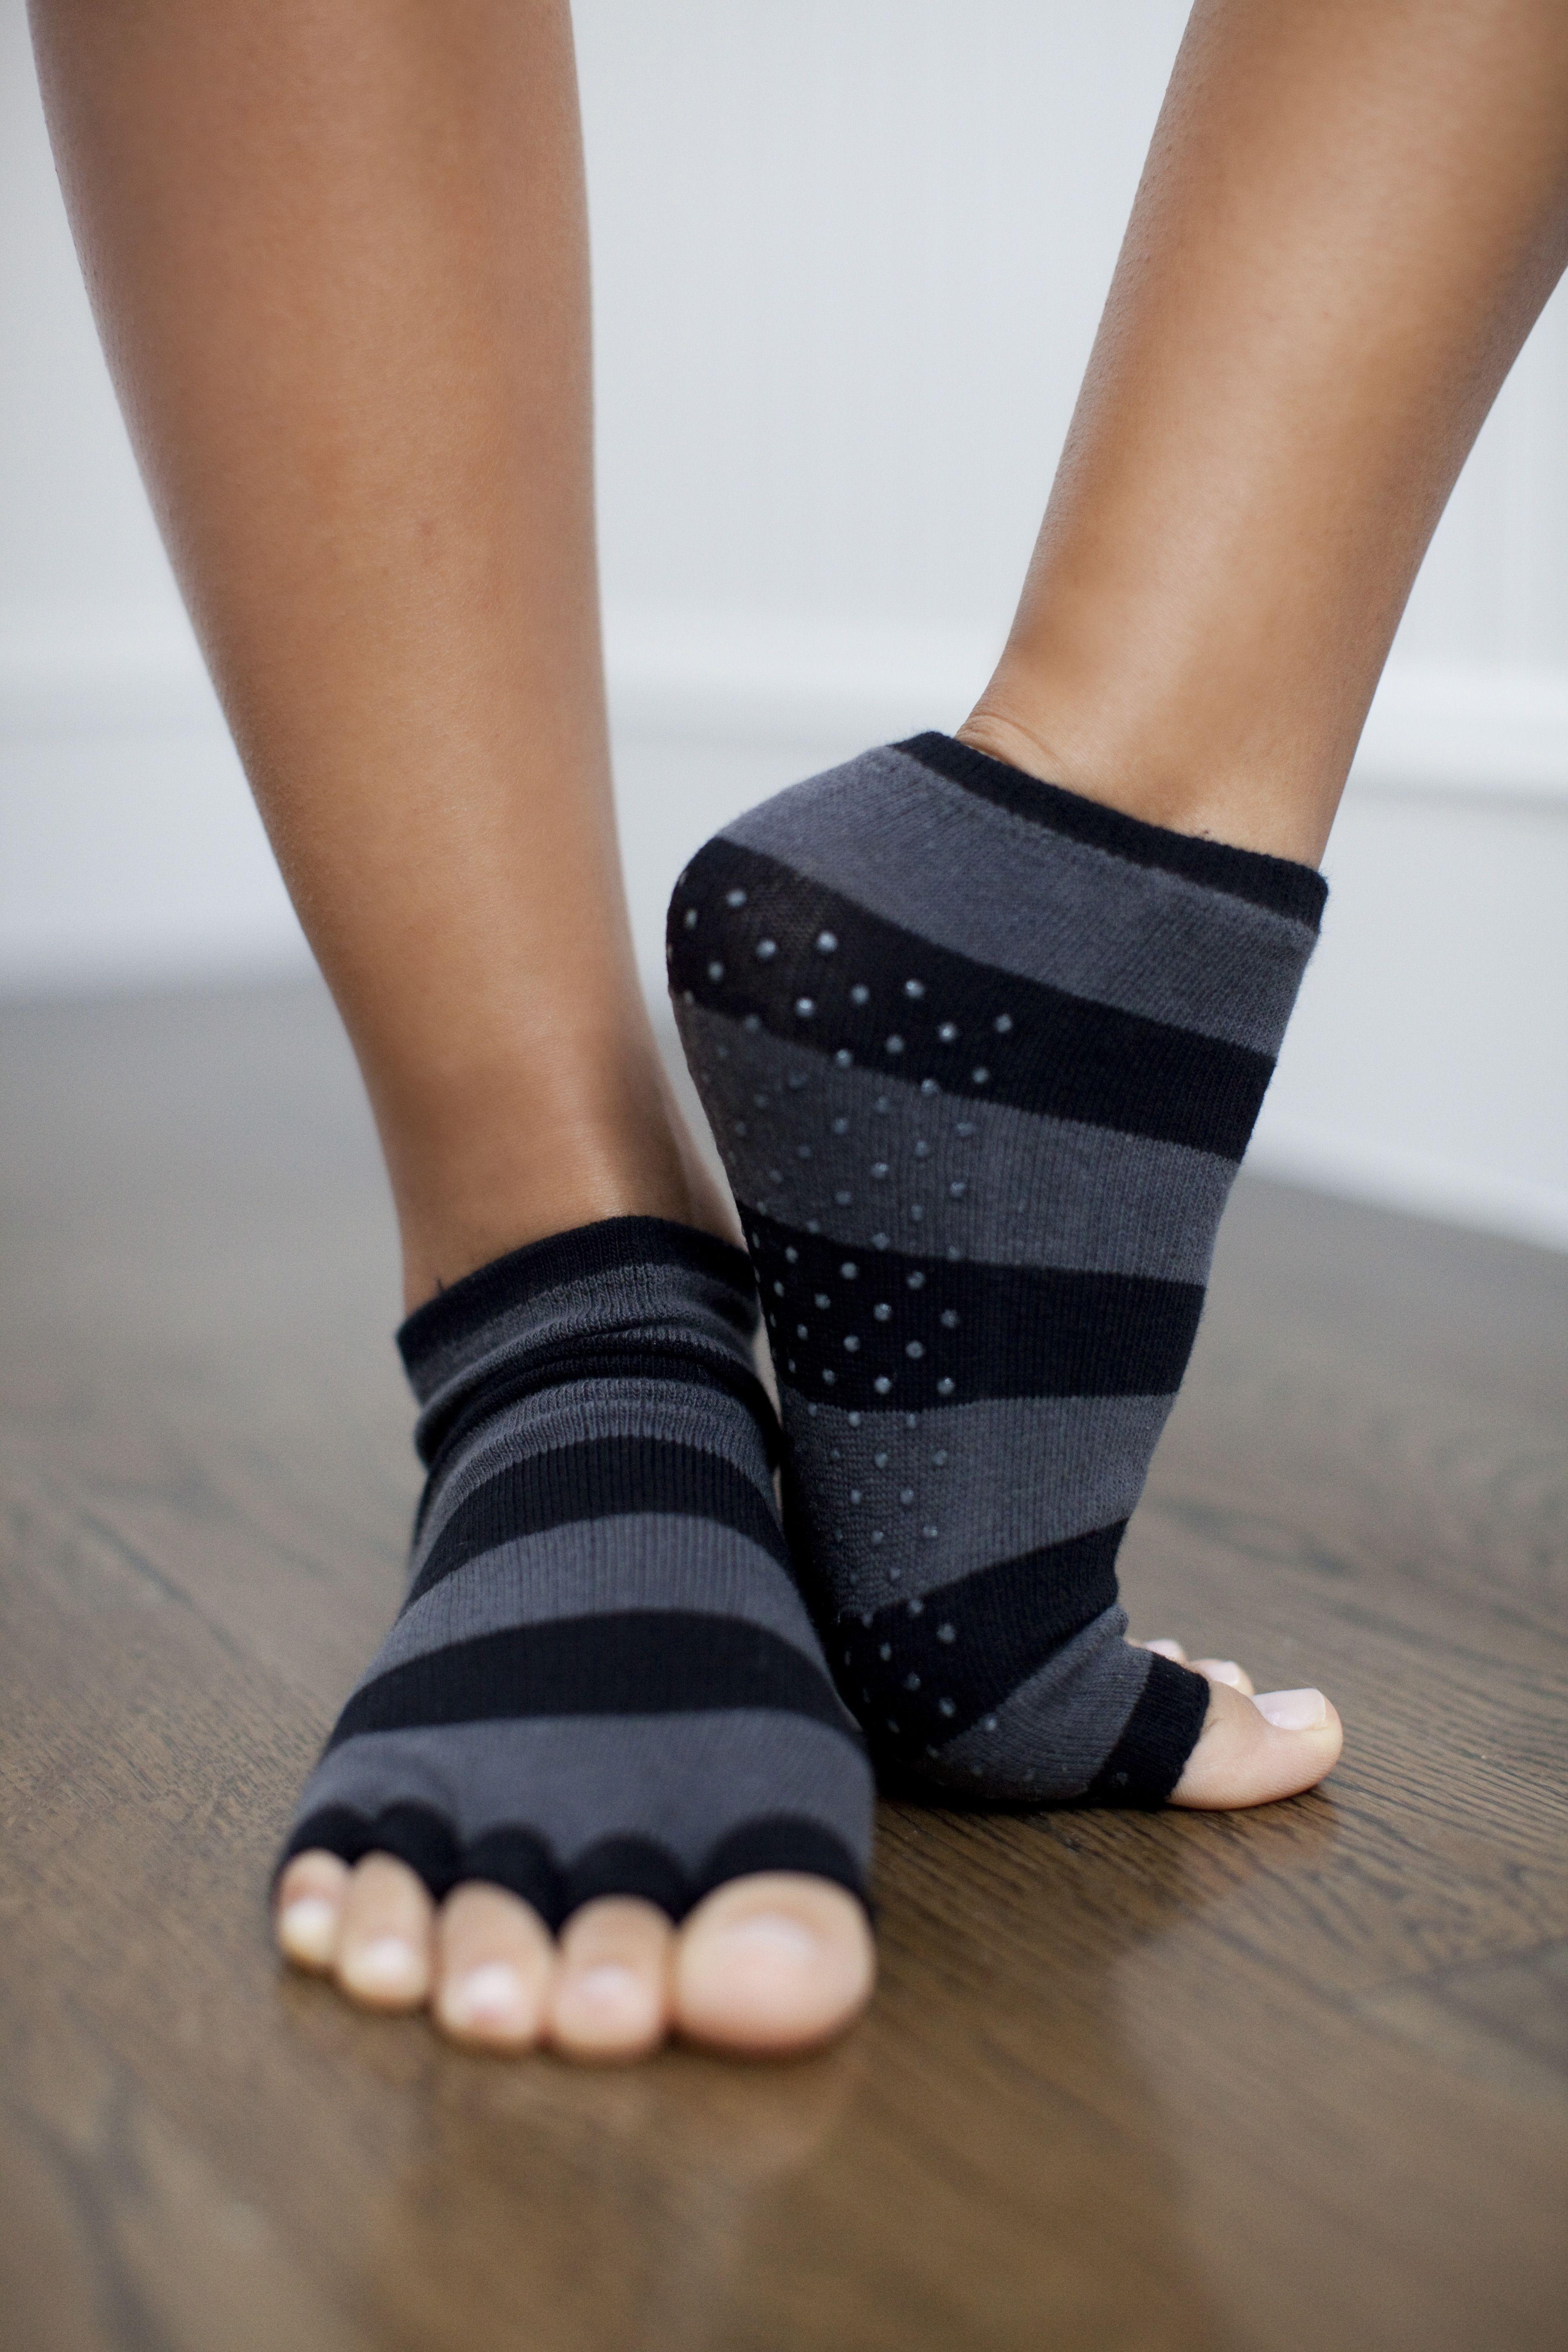 Toezies Sassy Stripes Toeless Non Slip Yoga Socks (With